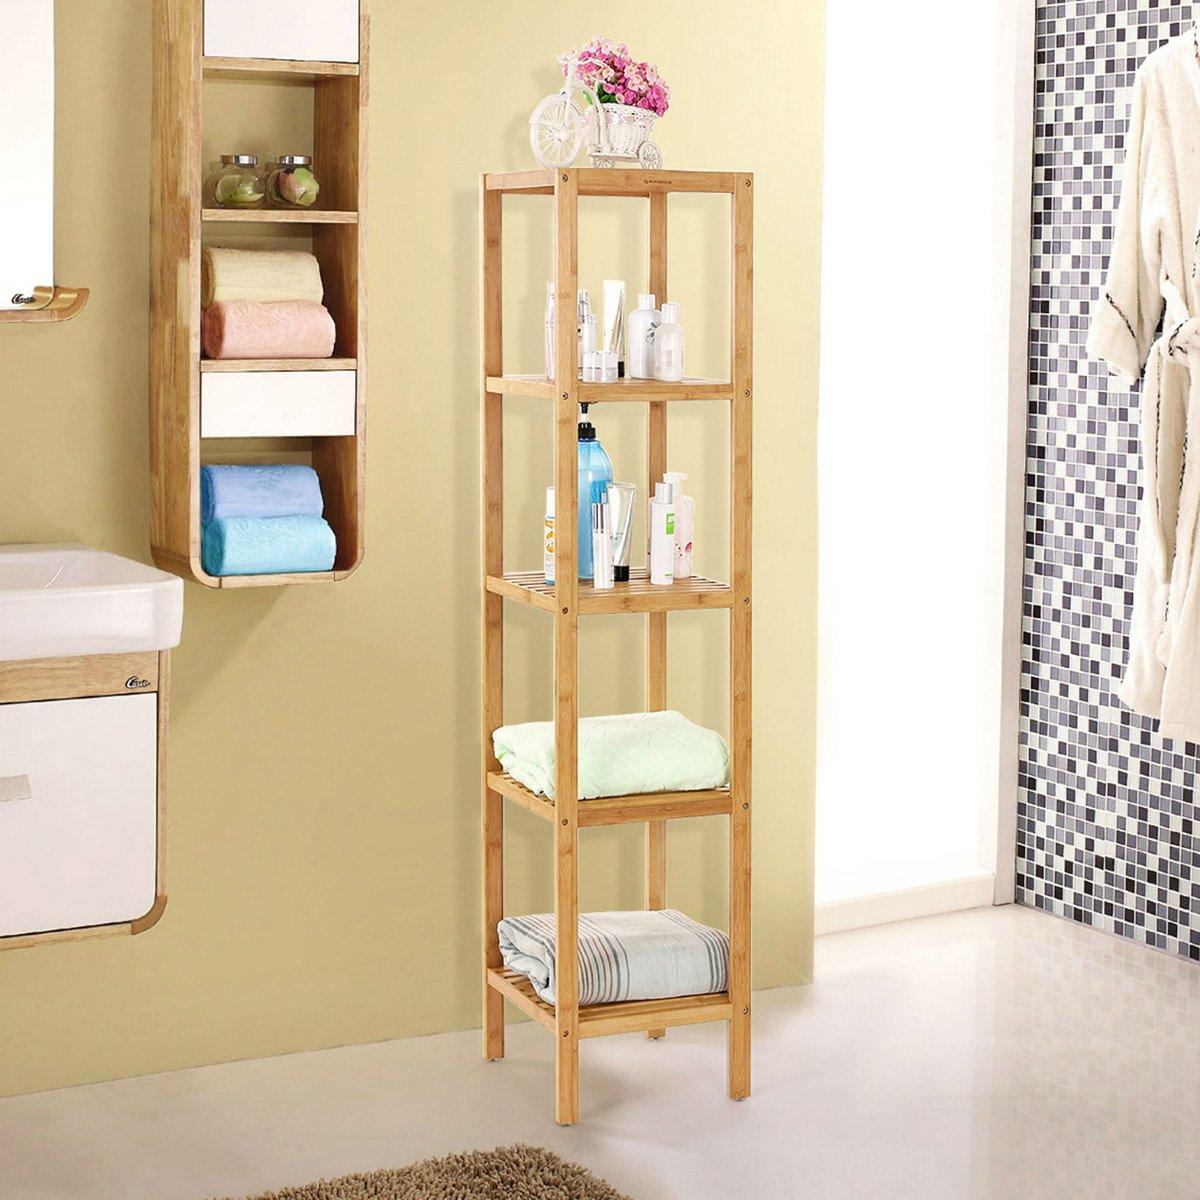 Bamboo bathroom shelf unit - Amazon Com Songmics 100 Bamboo Bathroom Shelf 5 Tier Multifunctional Storage Rack Shelving Unit Ubcb55y Home Kitchen